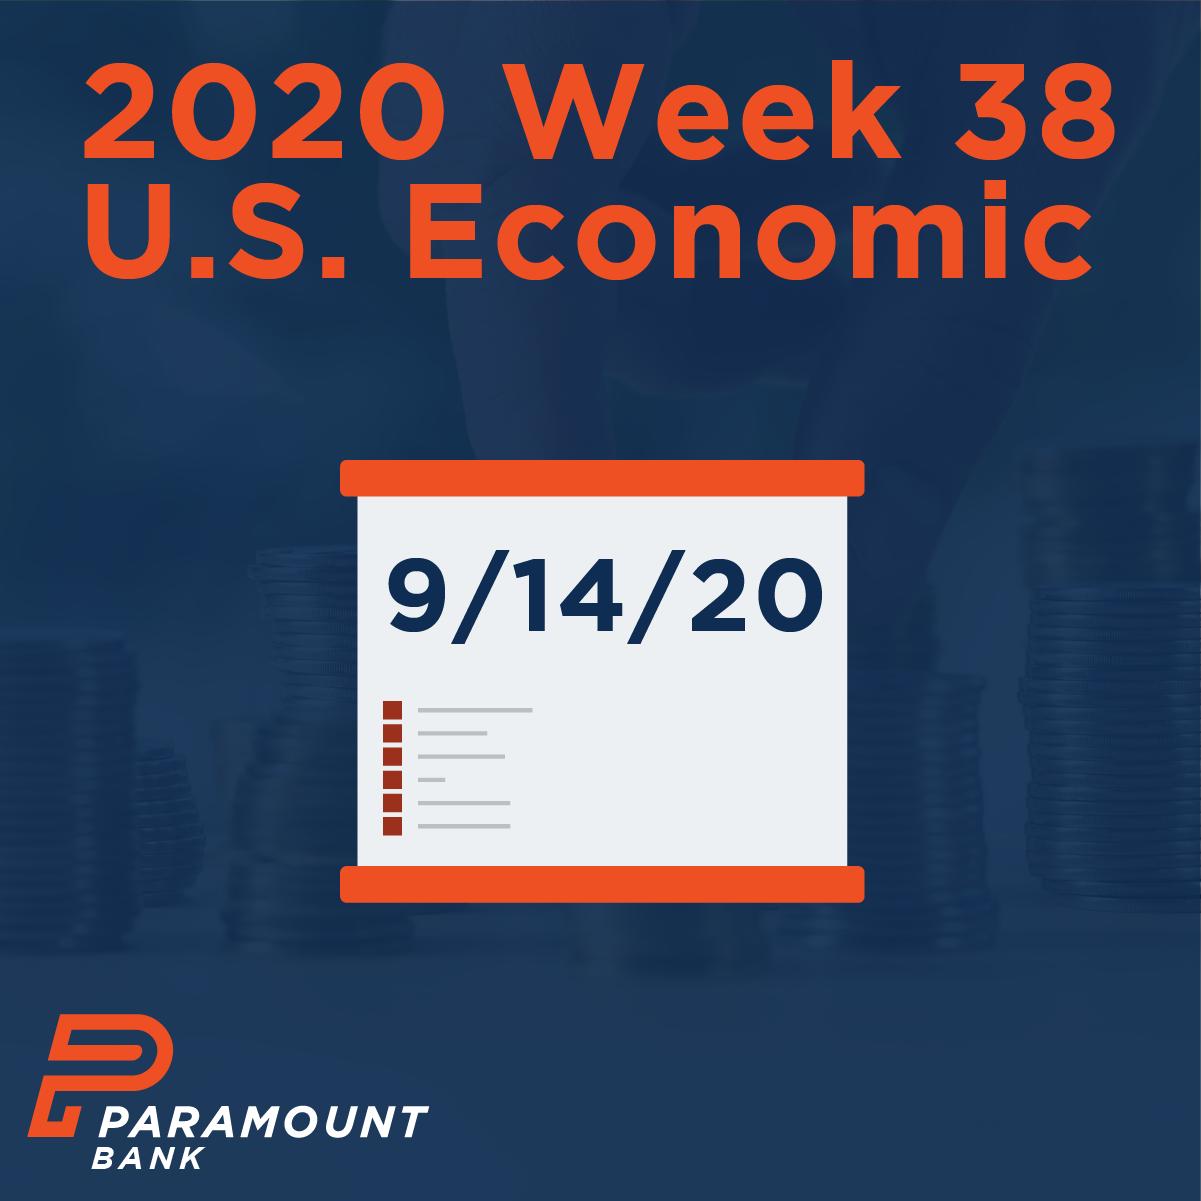 week 38 economic update